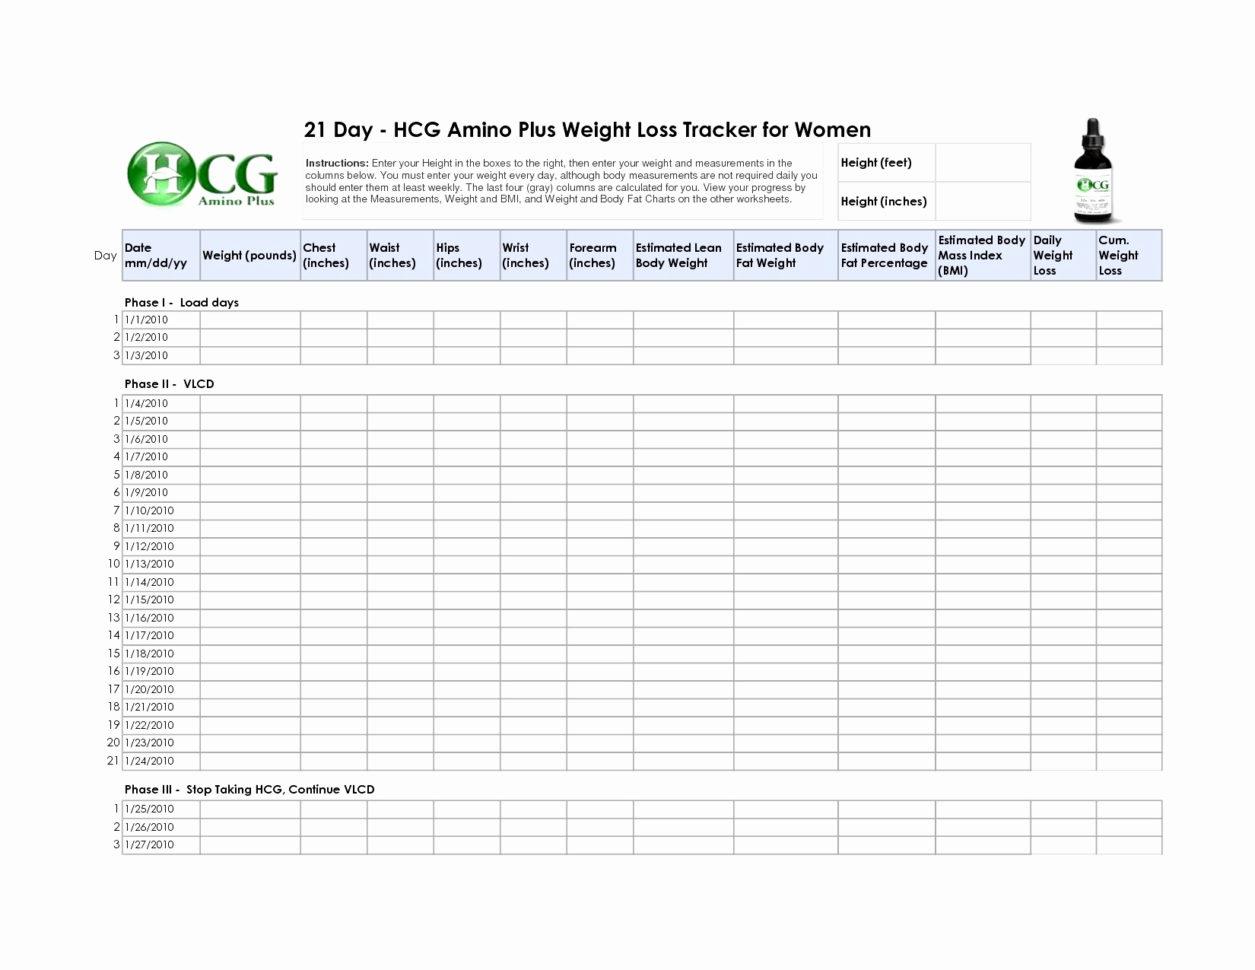 Concrete Estimating Spreadsheet Pertaining To Free Concrete Estimating Spreadsheet Takeoff Best Of  Pywrapper